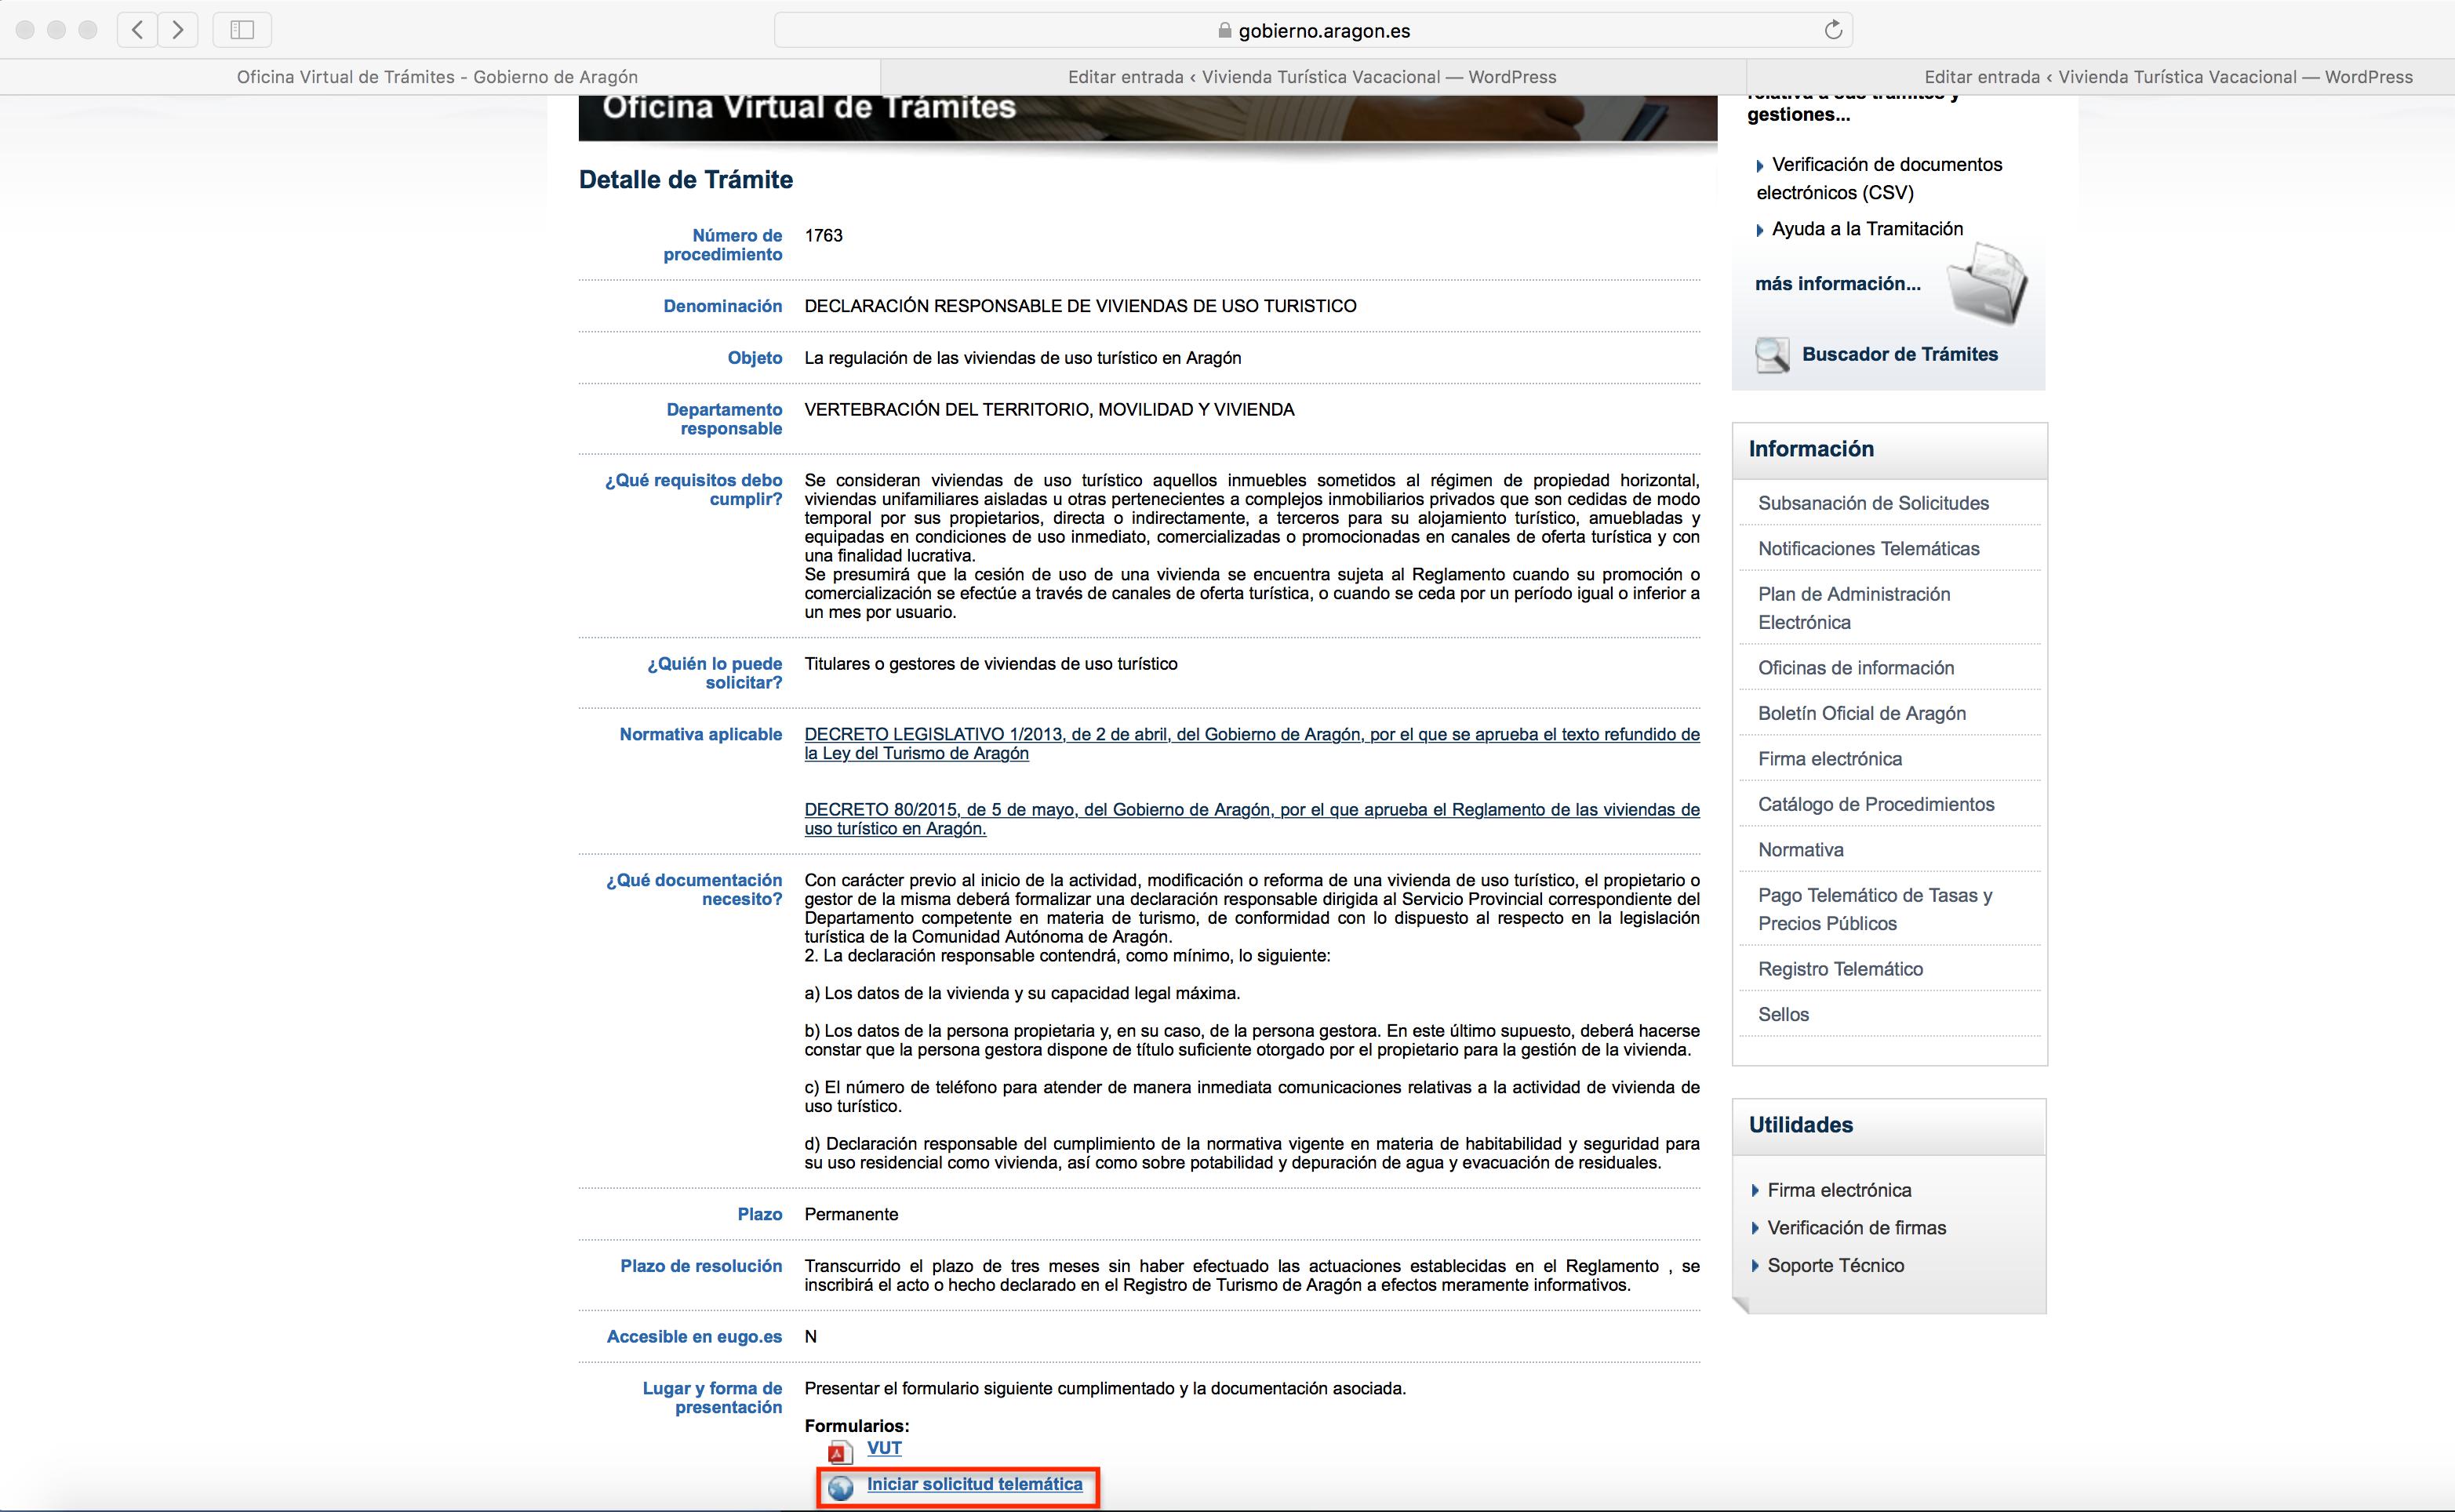 Oficina Virtual de Trámites > Iniciar solicitud telemática